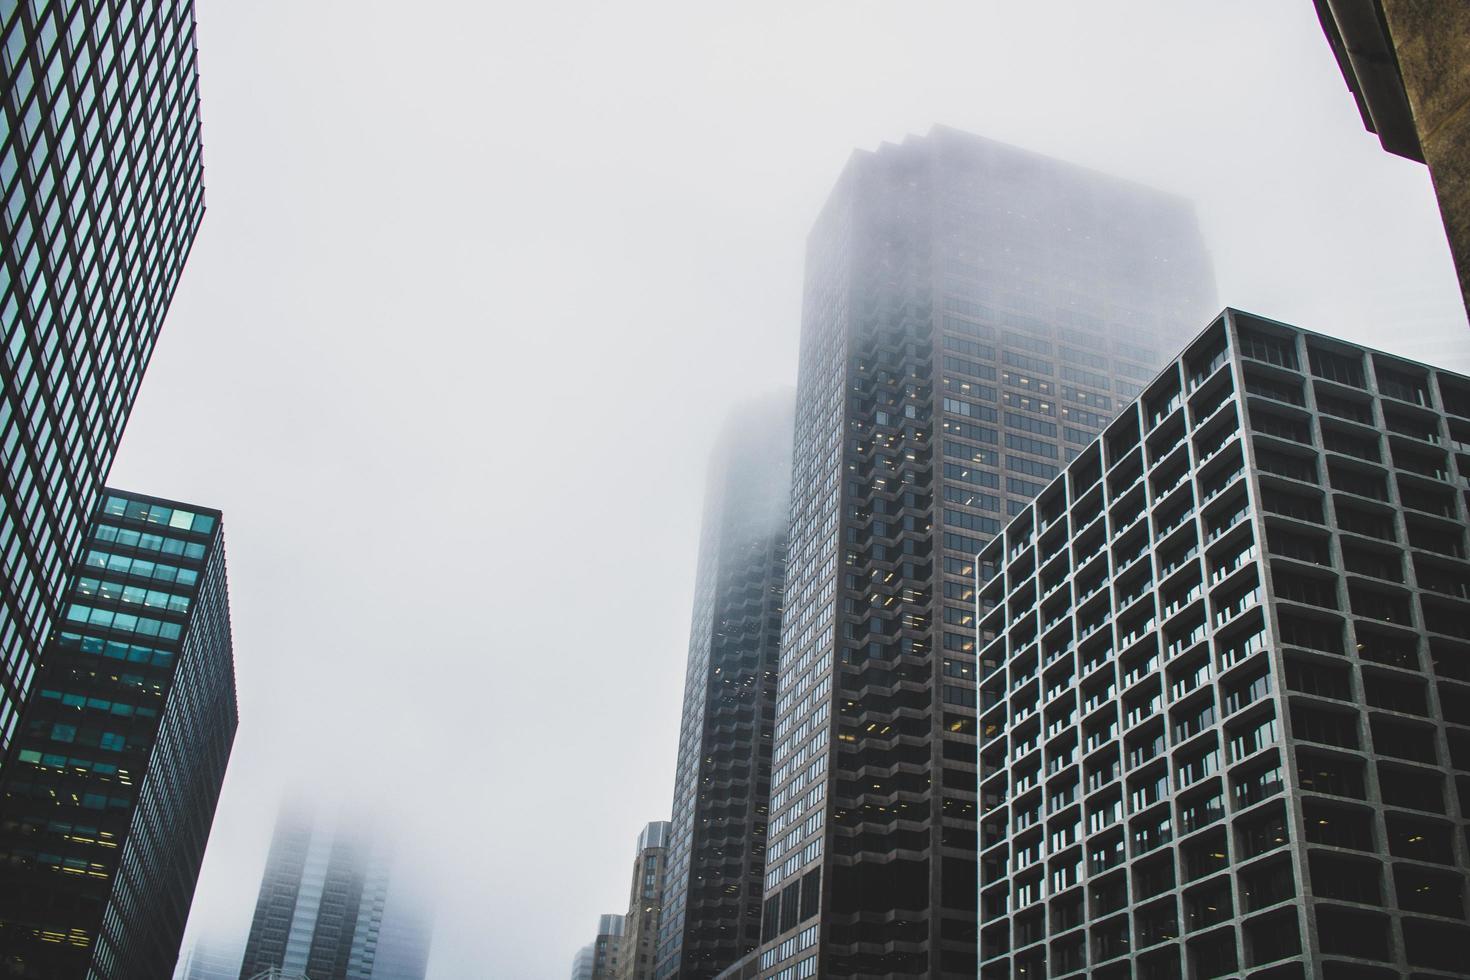 Foggy skyscraper buildings from below photo